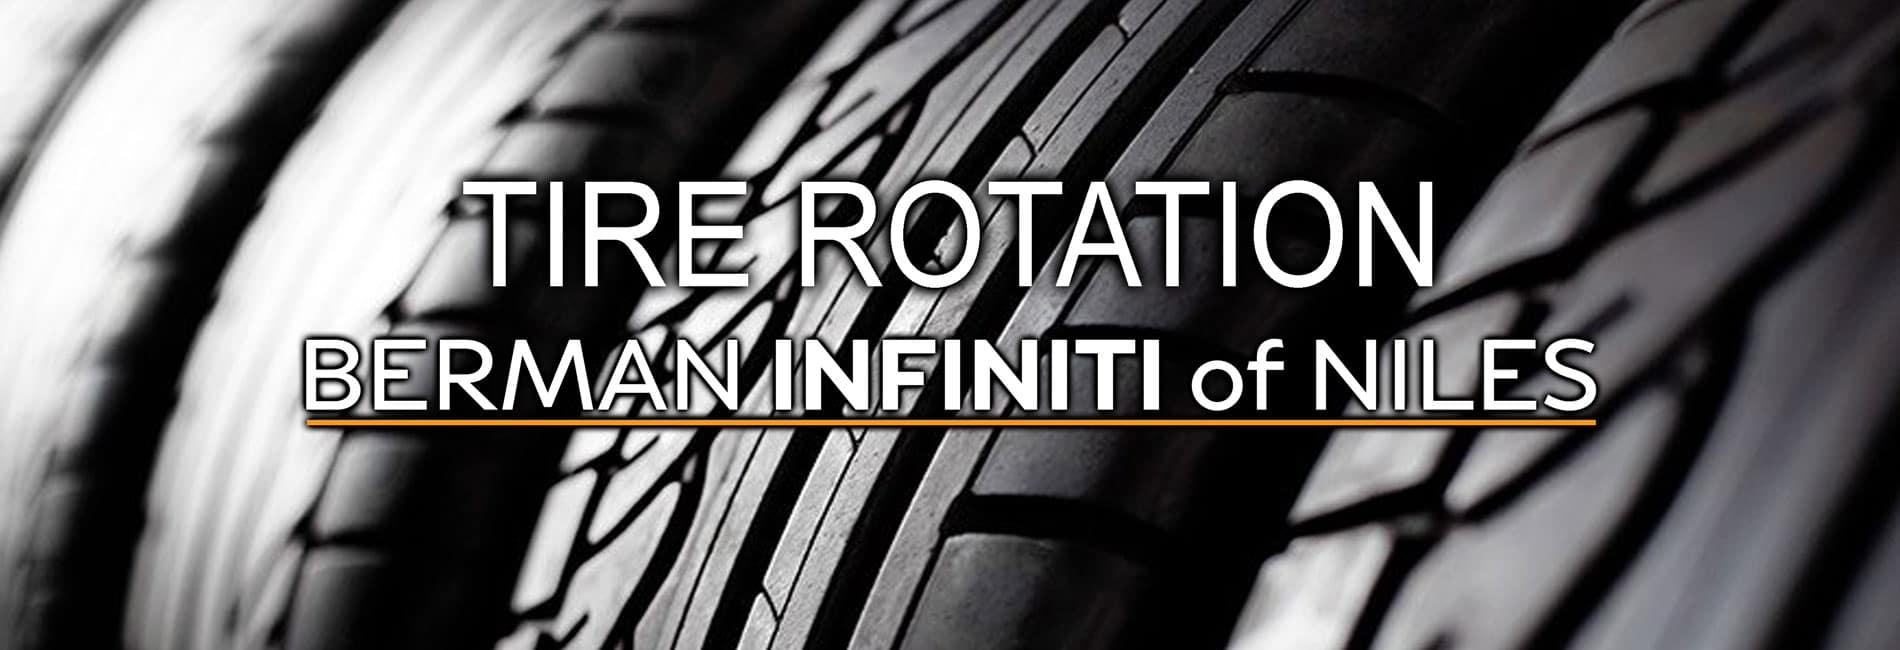 Tire Rotation Service at Berman INFINITI of Niles